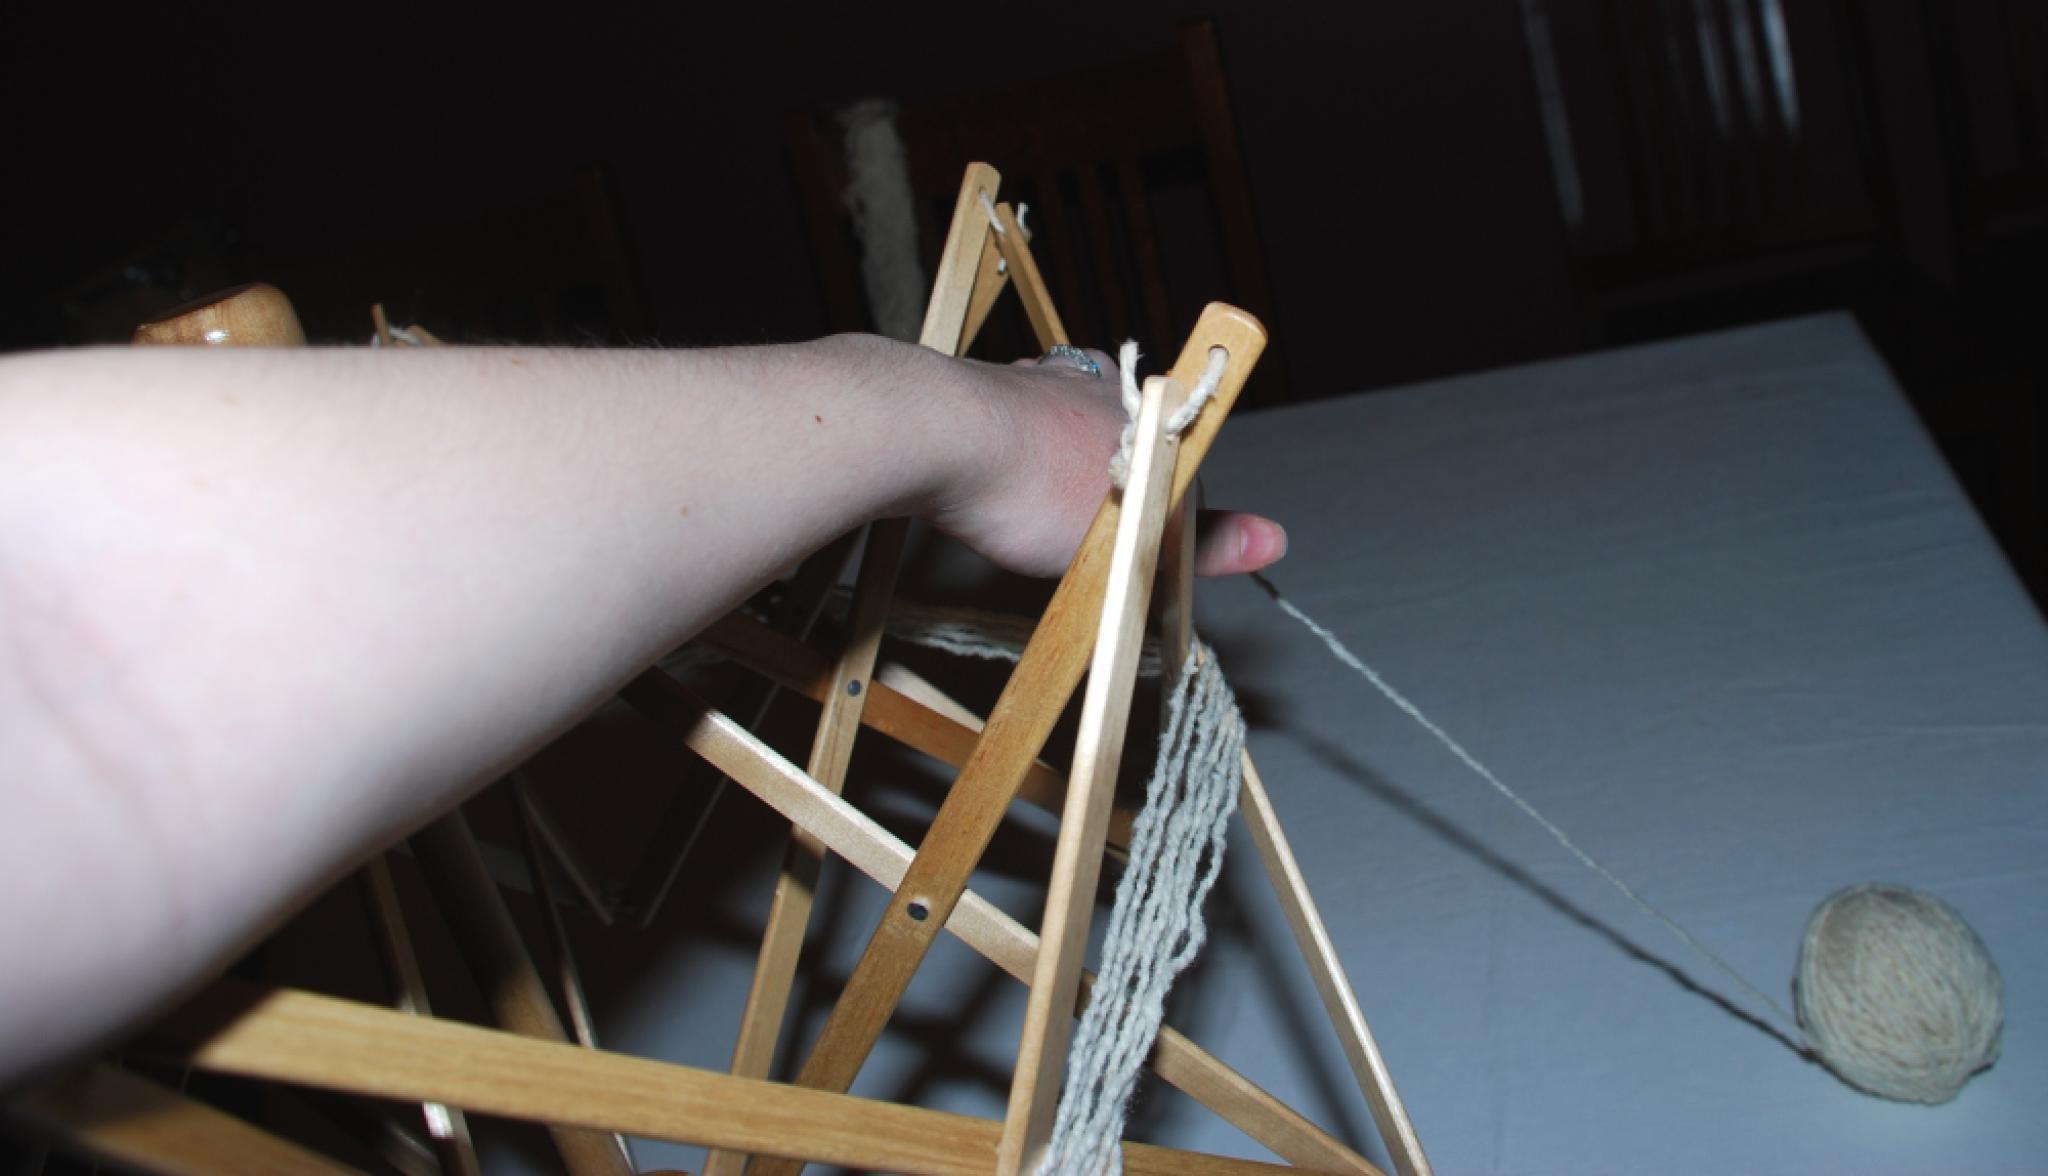 Person winding blue yarn over the yarn swifter.